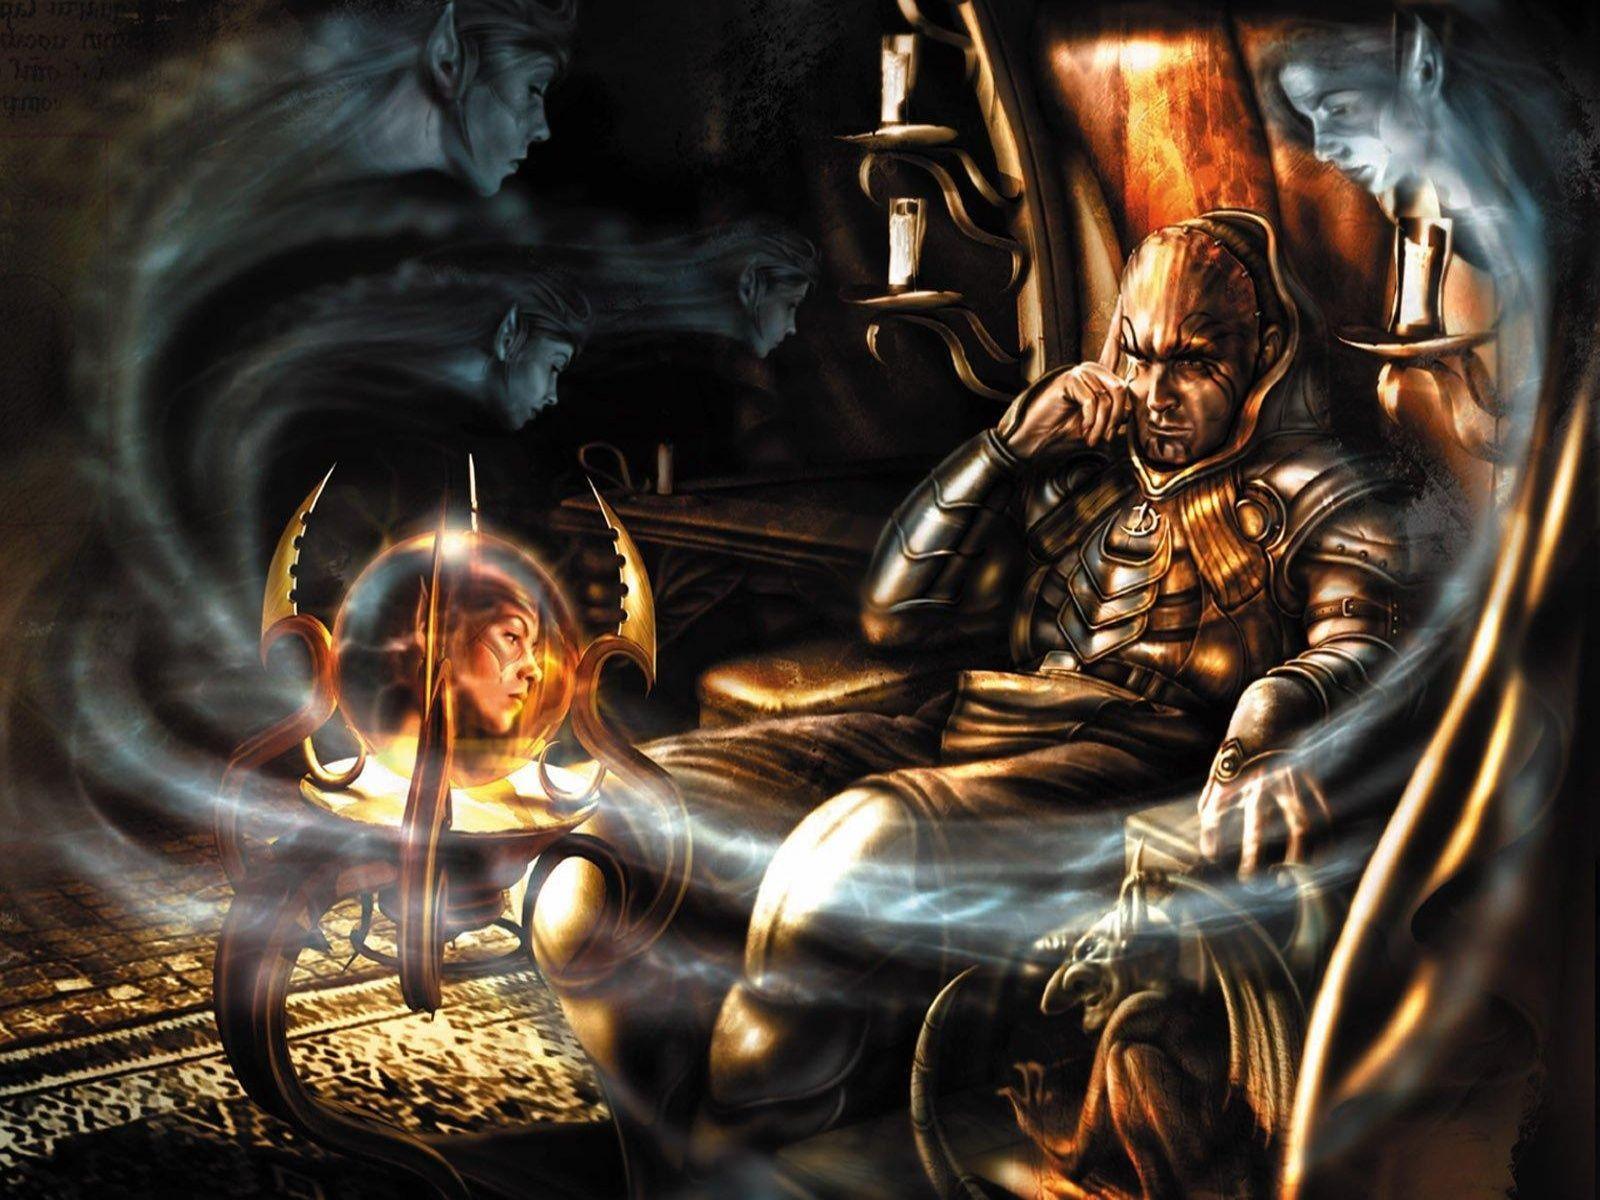 Google Image Result For Http Www Fantasy Wallpapers Com Wallpapers Fantasy Magic Soul Game 1600x1200 Jpg Baldur S Gate Forgotten Realms Baldur S Gate 2